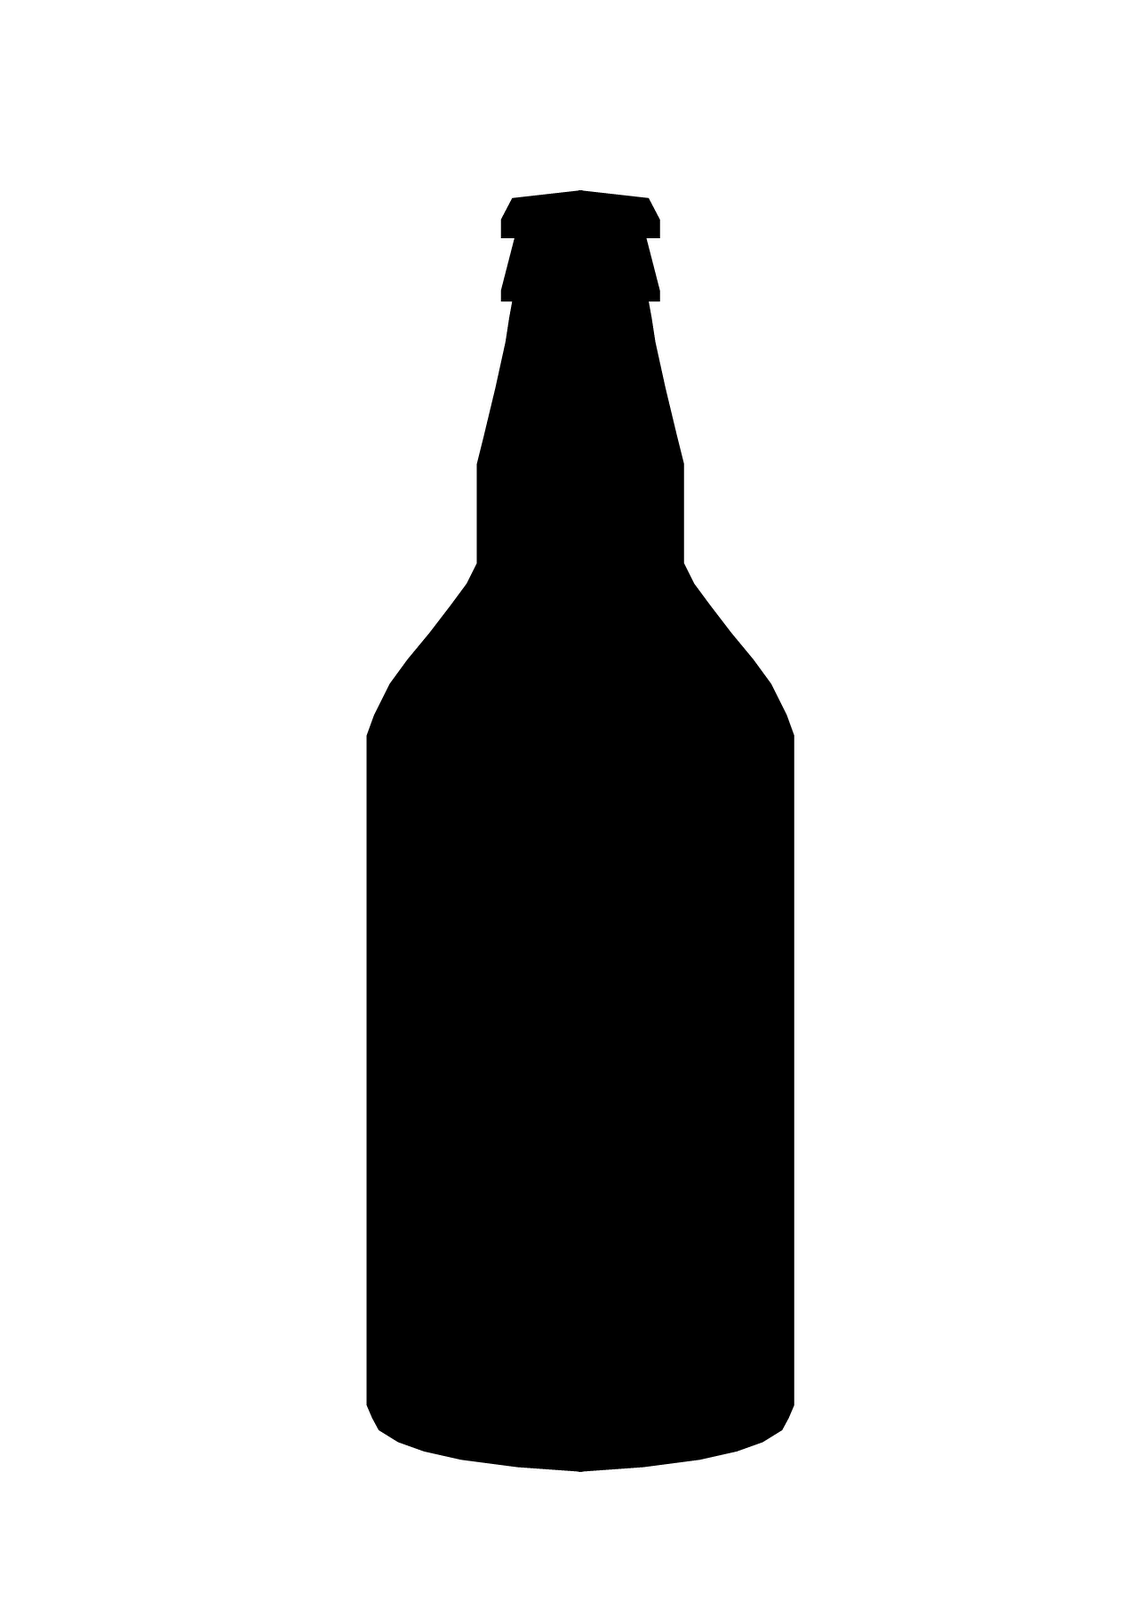 Beer Bottle Silhouette Google Search Bottle Beer Bottle Beer